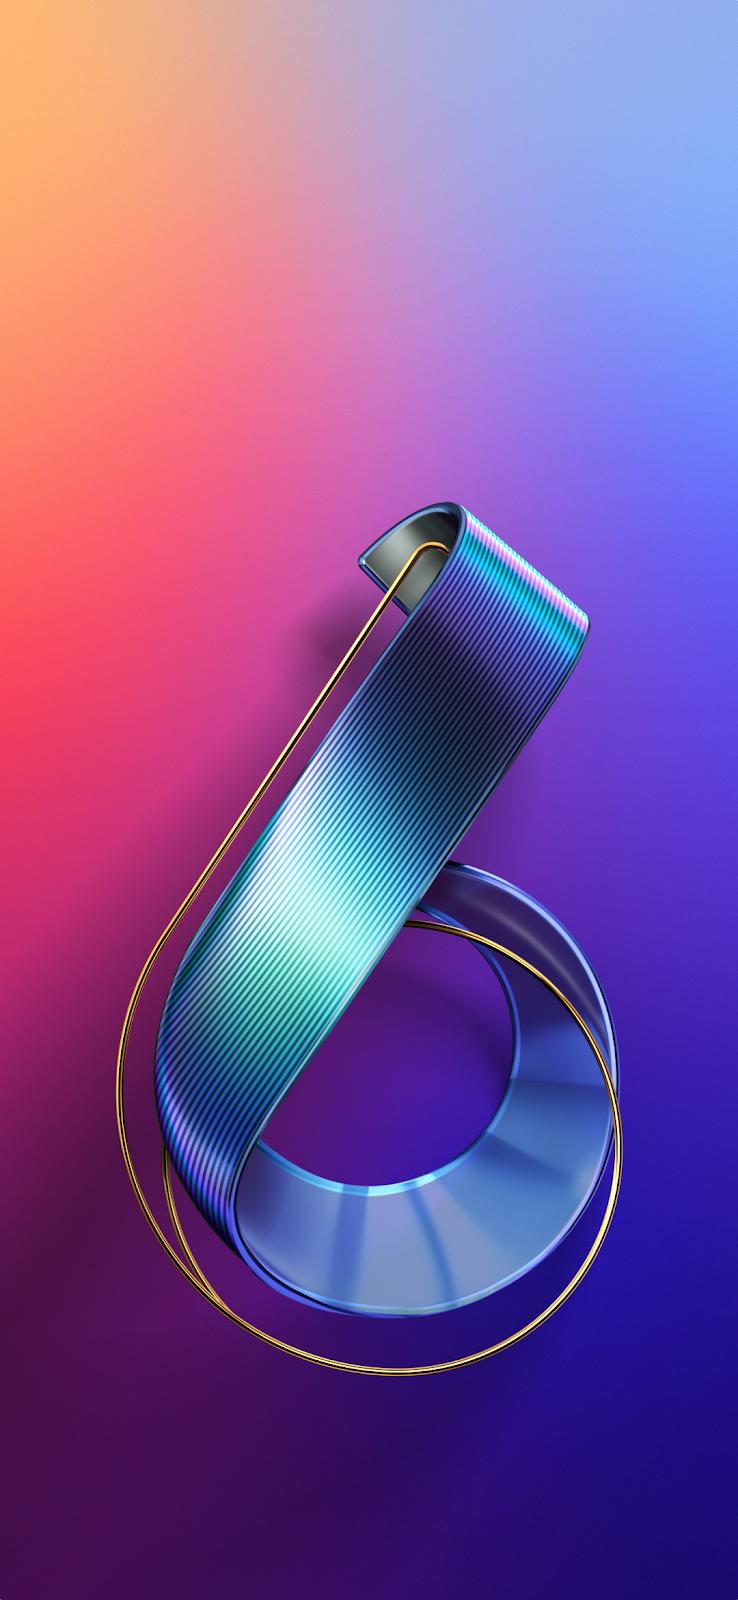 Hình nền gốc của Asus Zenfone 6 2019